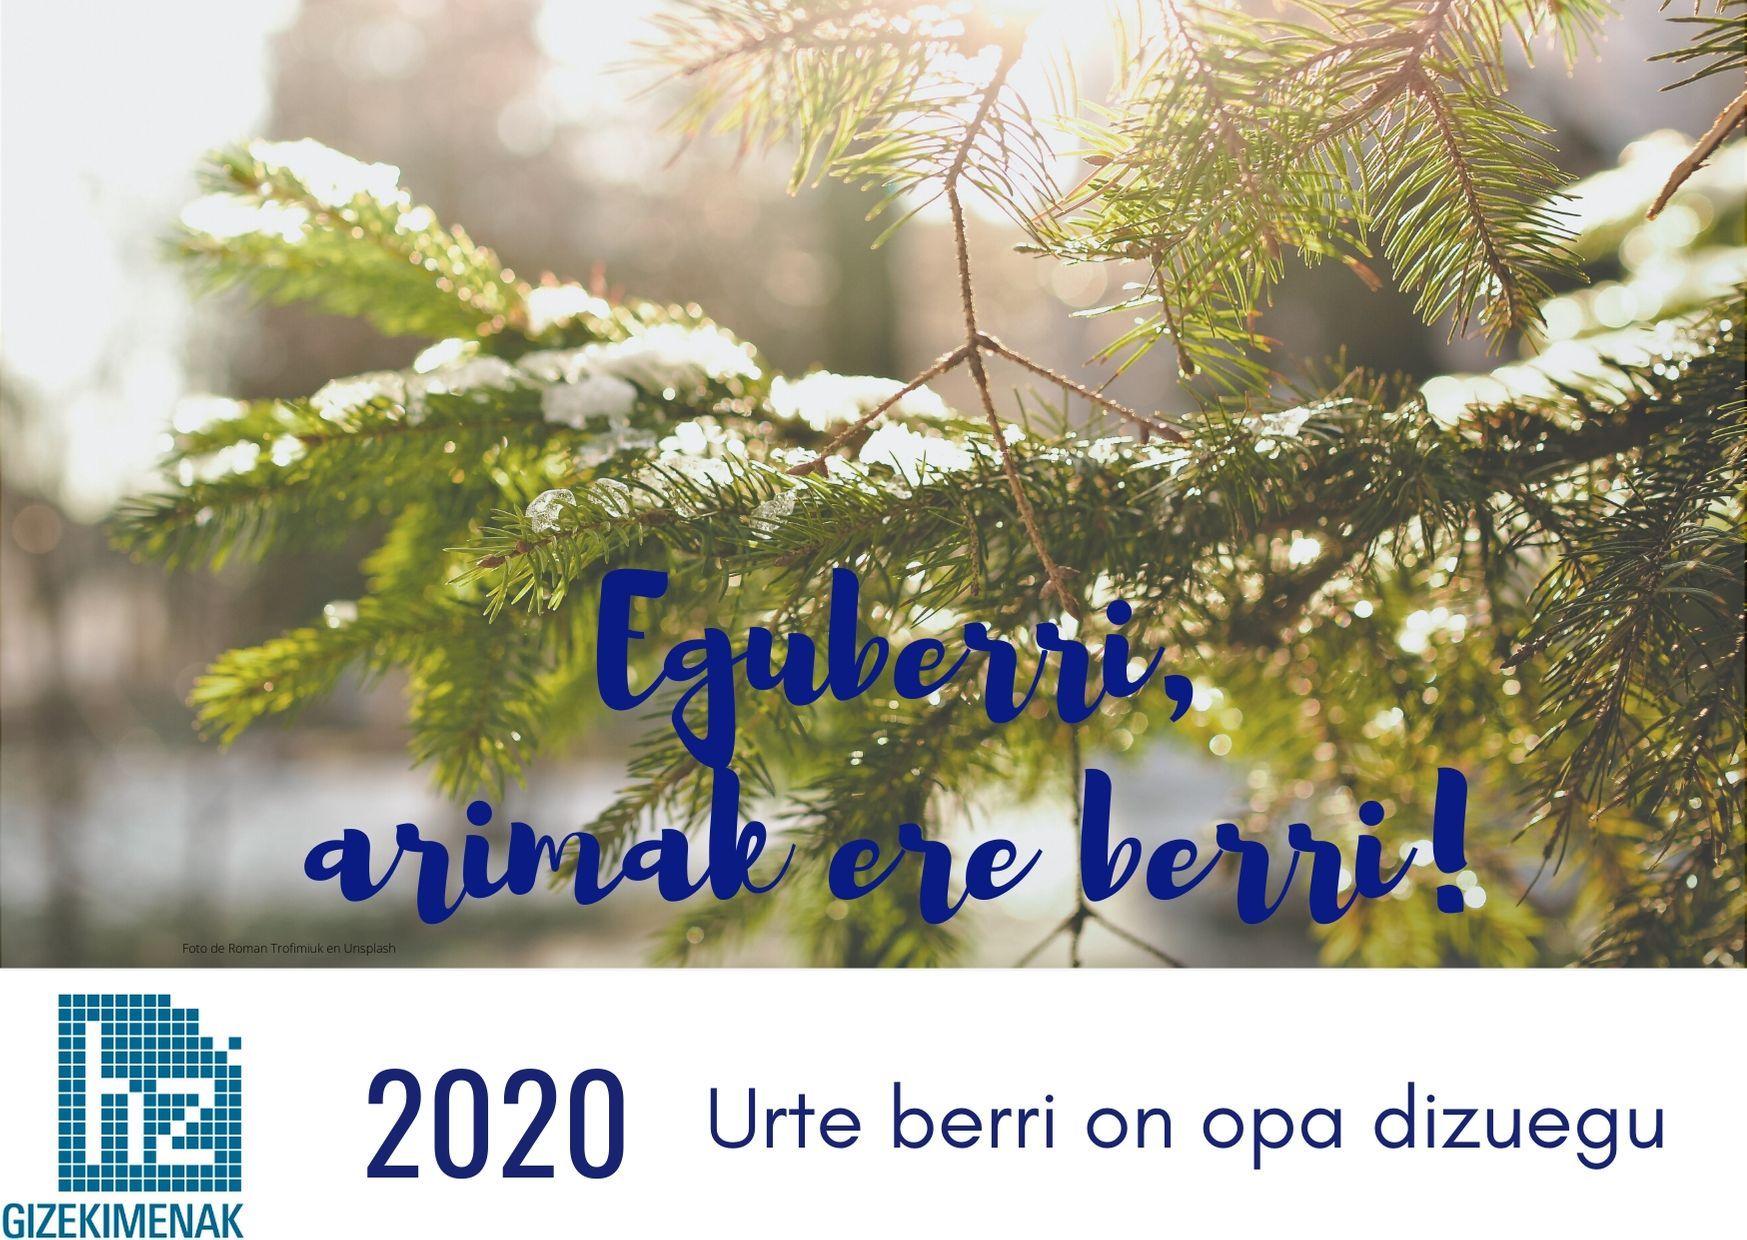 urtebrrionhz2020-